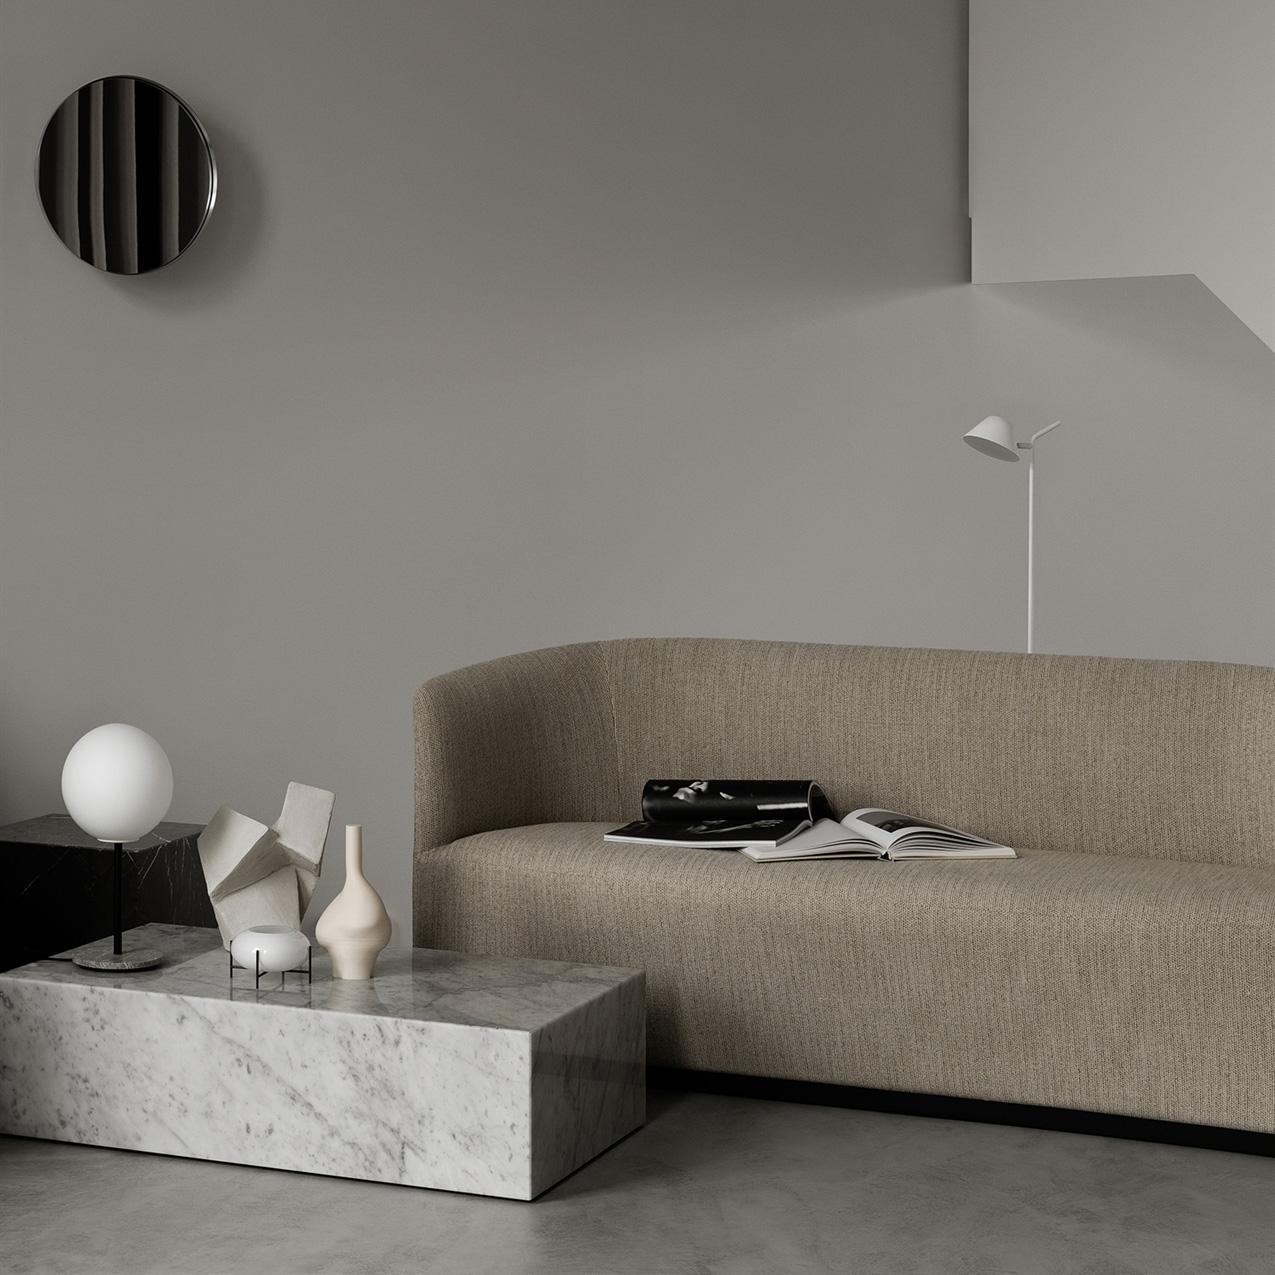 peek-floor-white_1275x1275